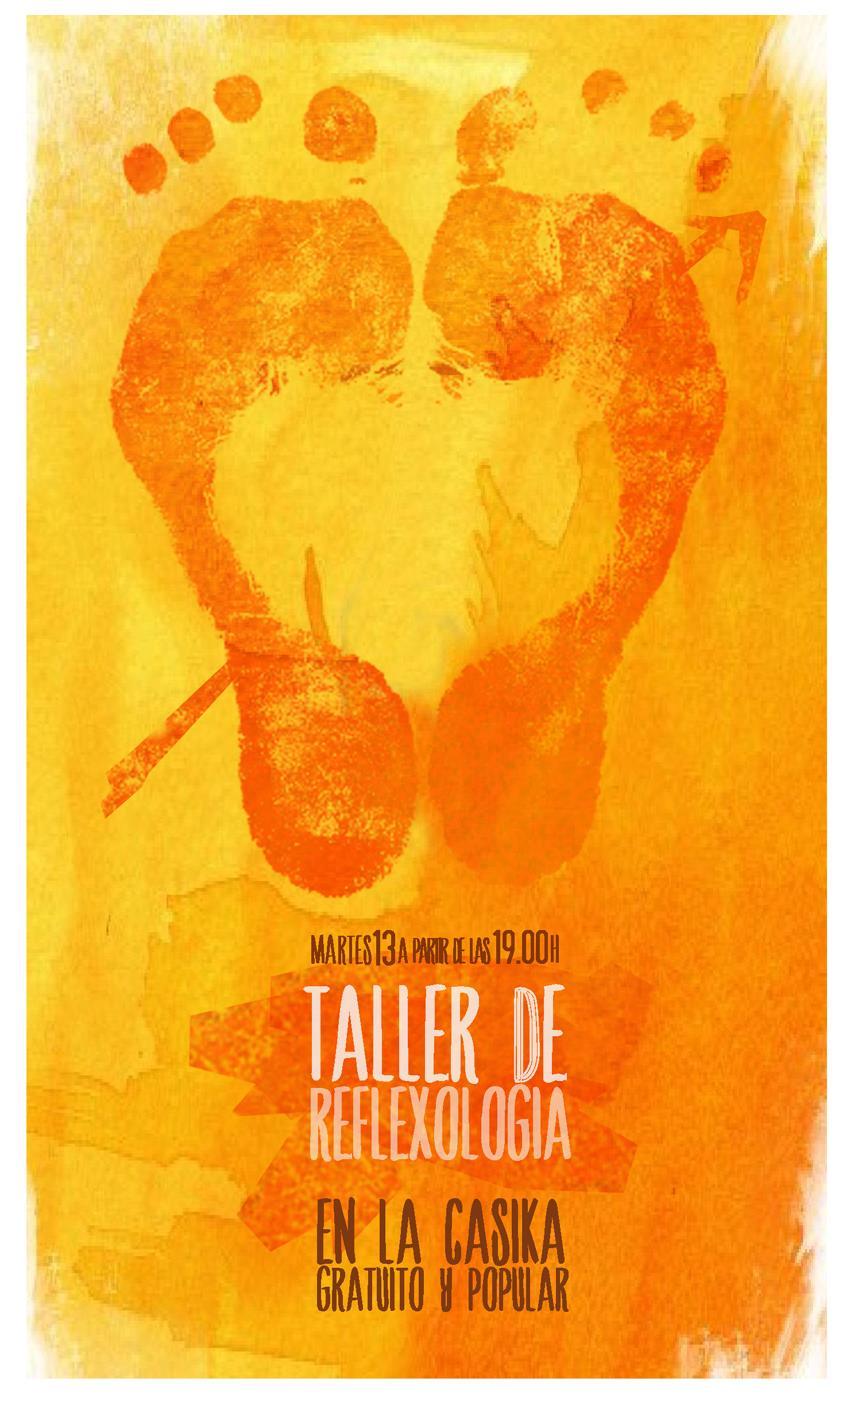 cartel taller reflexologia martes 13 agosto en lacasika Mostoles